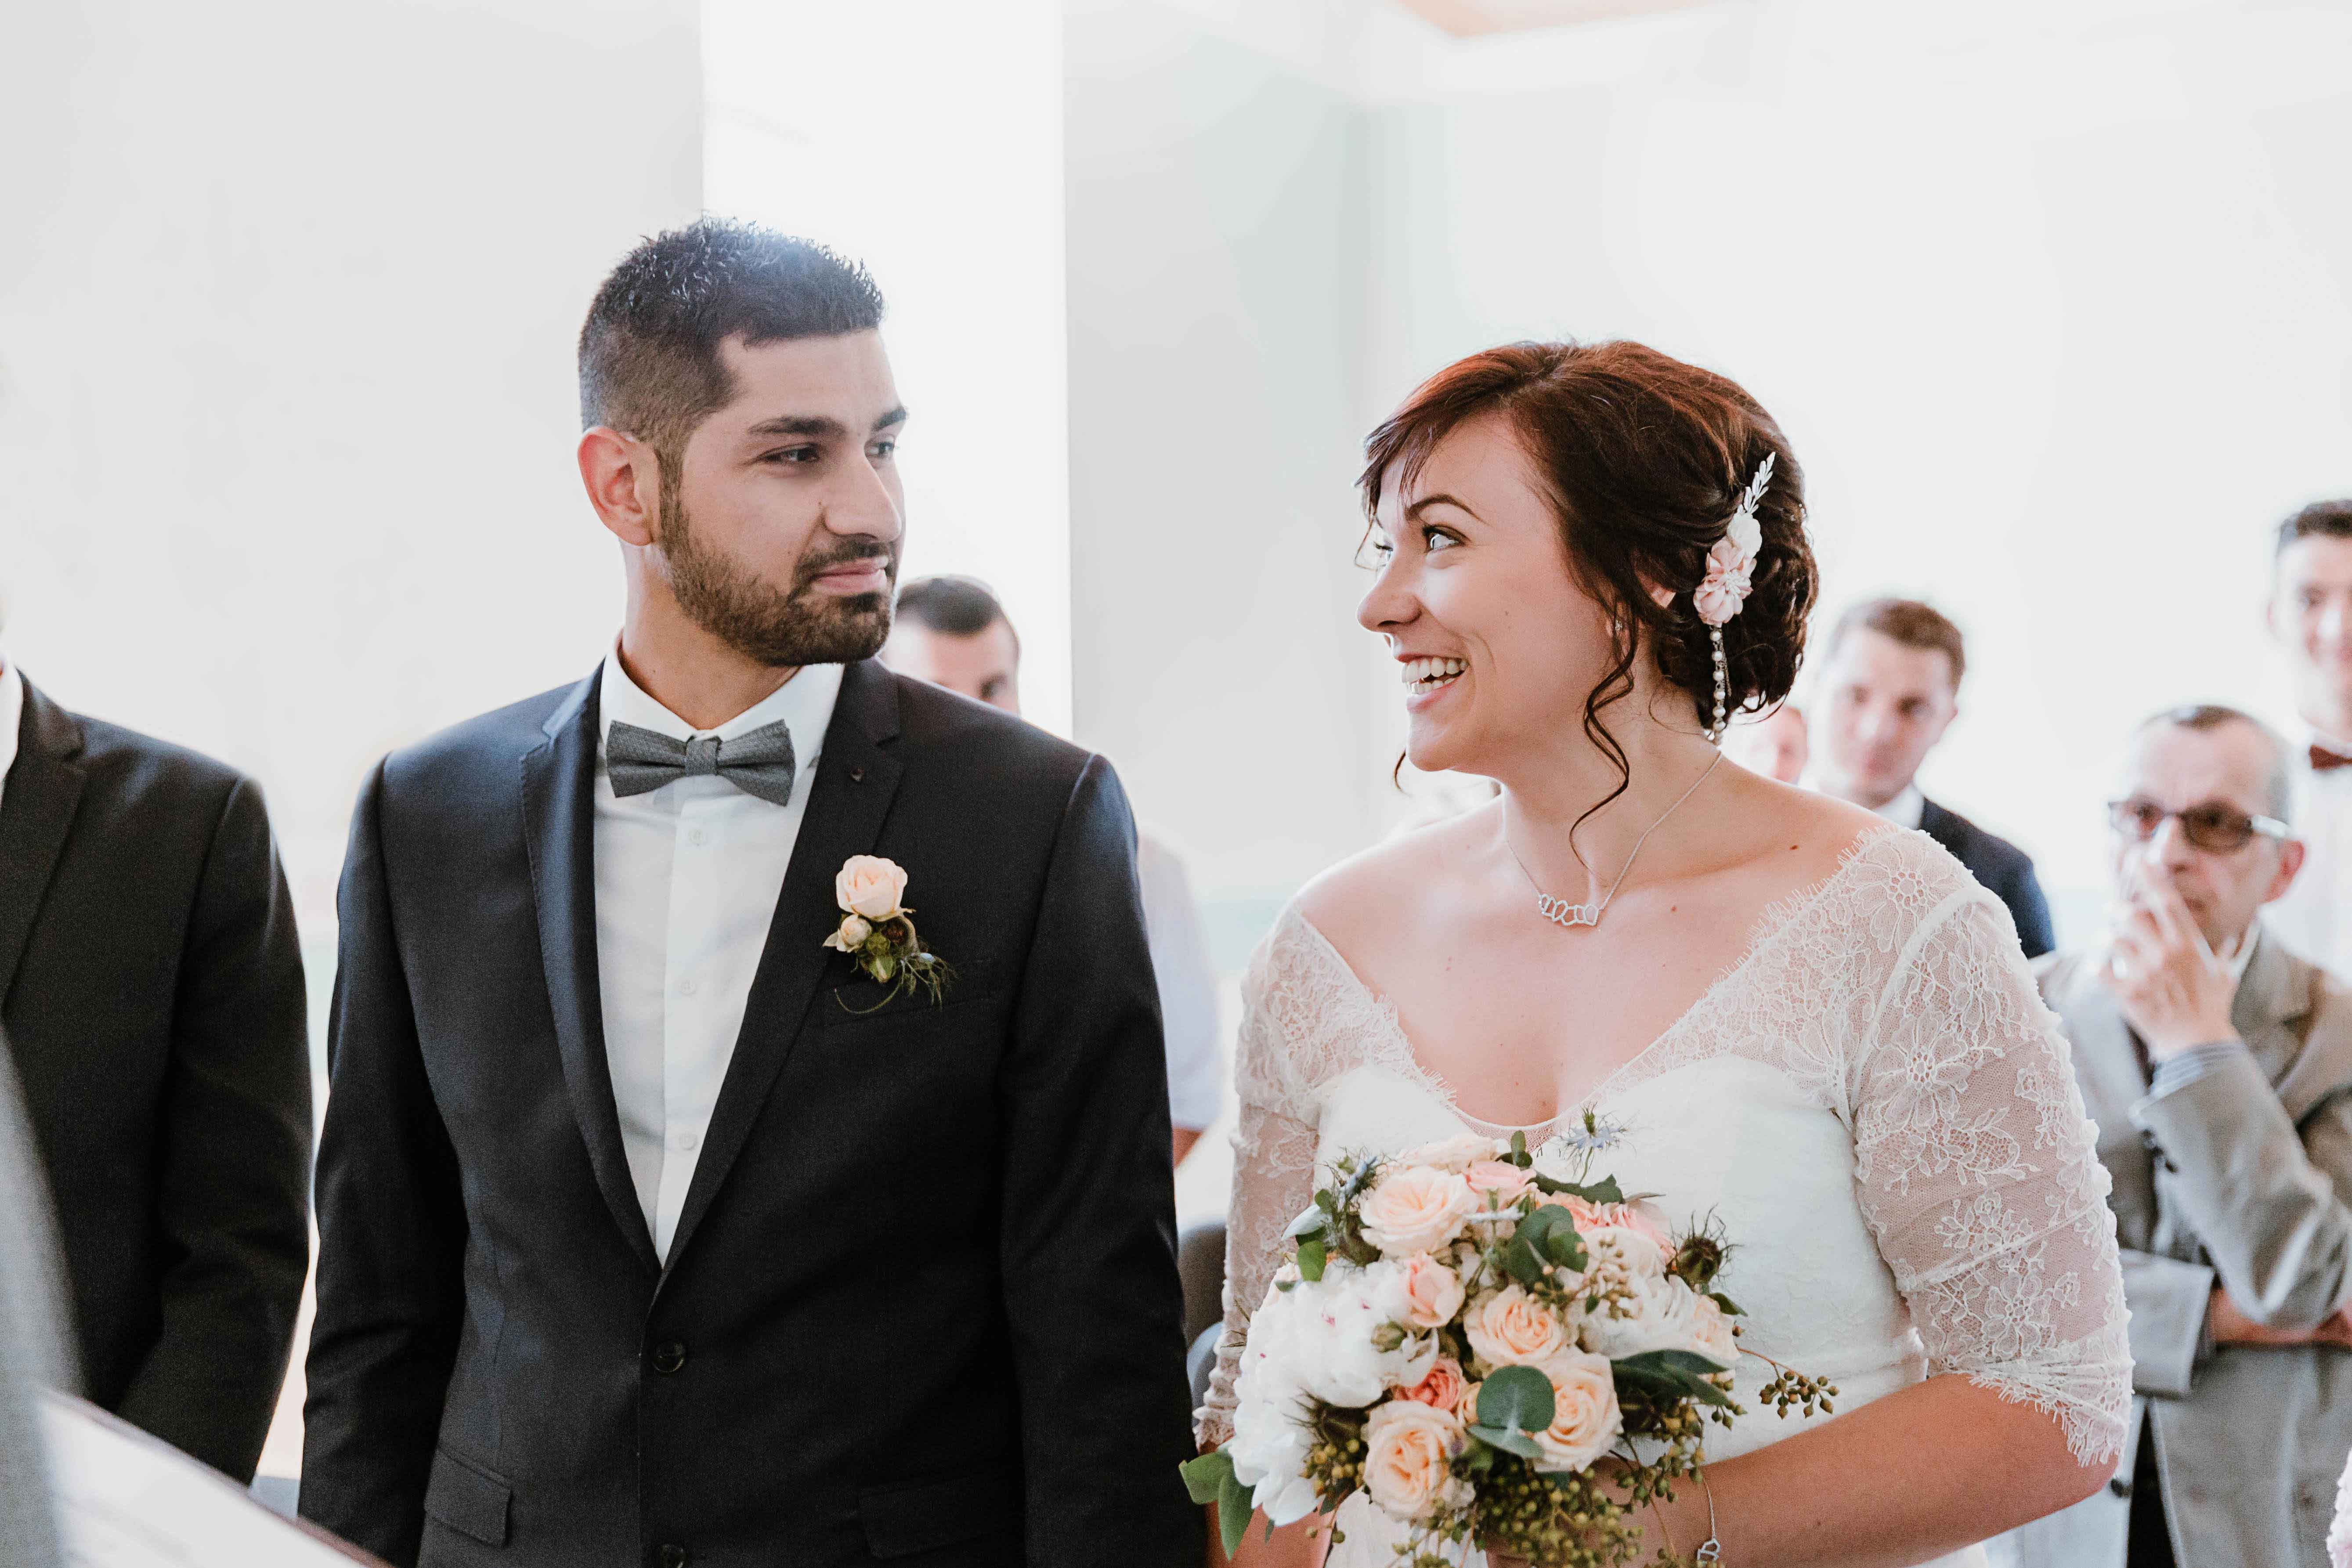 photographe fut d'avenas beaujolais mariage mariés